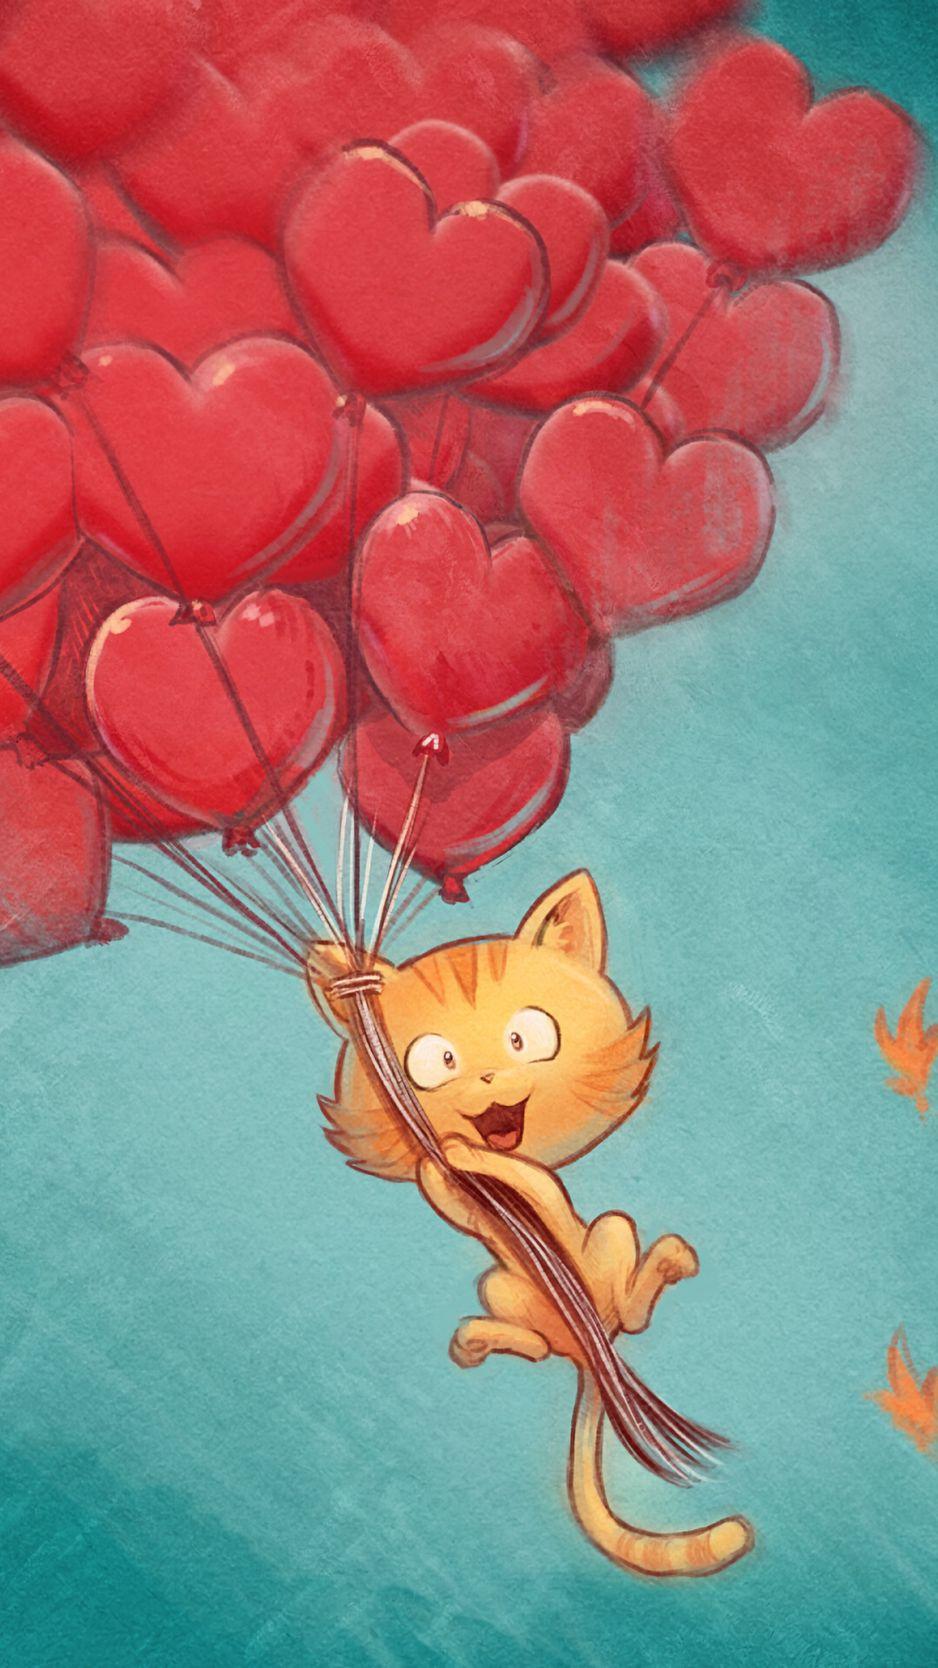 938x1668 Wallpaper cat, balloons, hearts, flight, sky, art